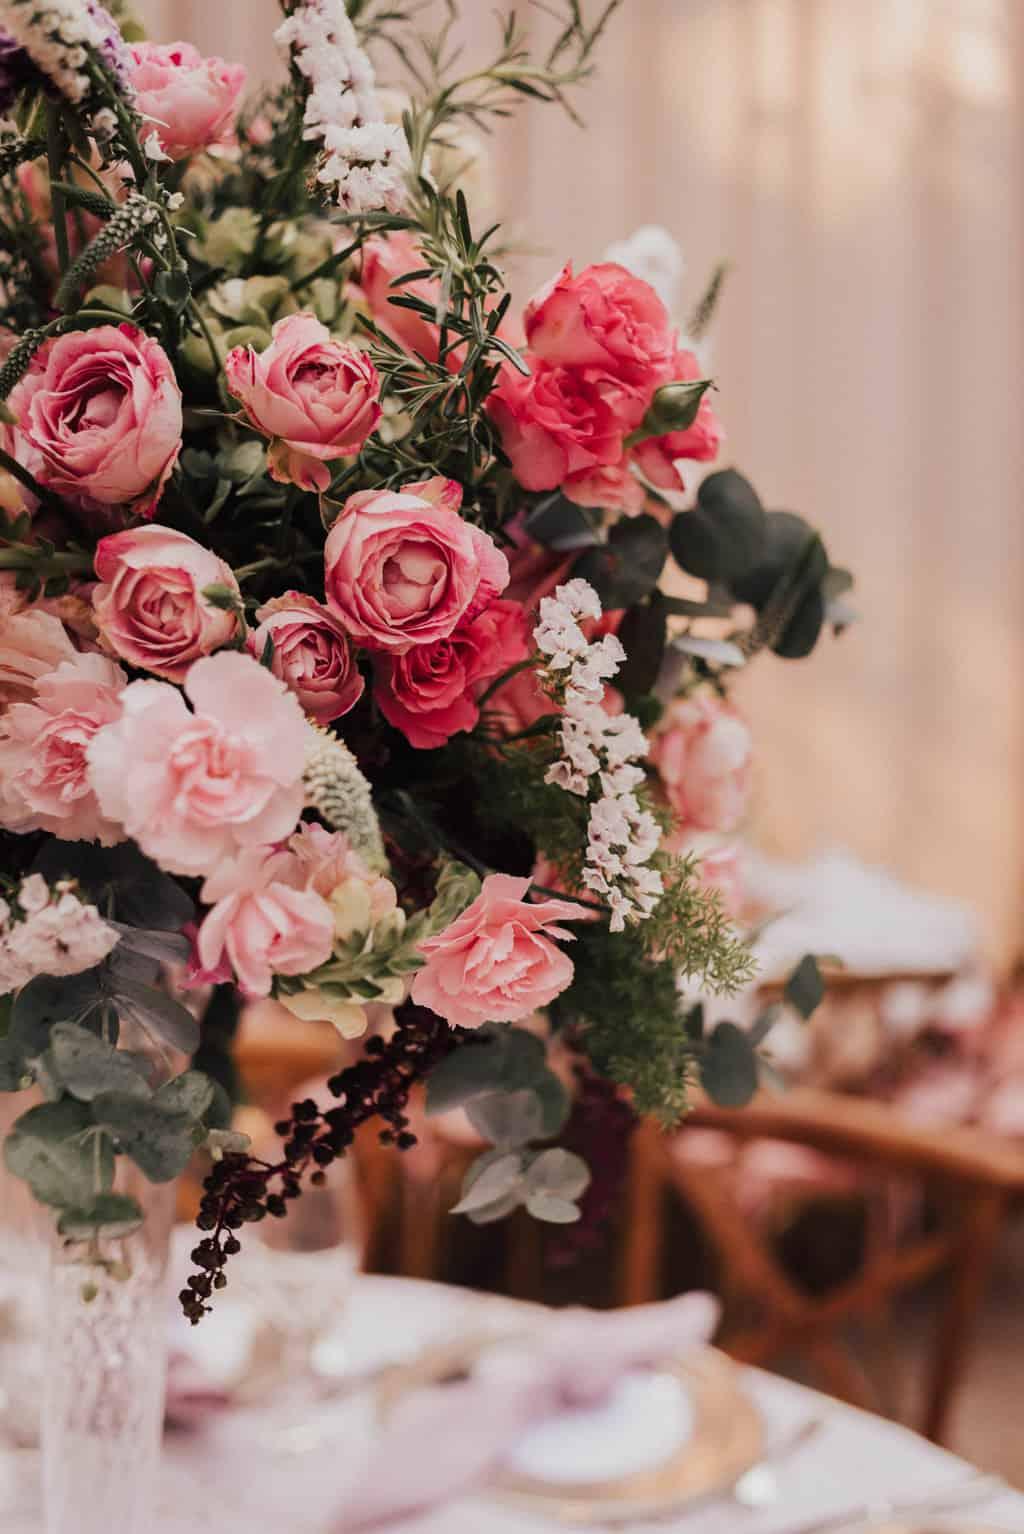 Boutique-de-Cena-casamento-Rebeca-e-Eldrey-Fazenda-Vila-Rica-Fotografia-Mana-Gollo-mesa-dos-convidados-Toda-de-Branco23